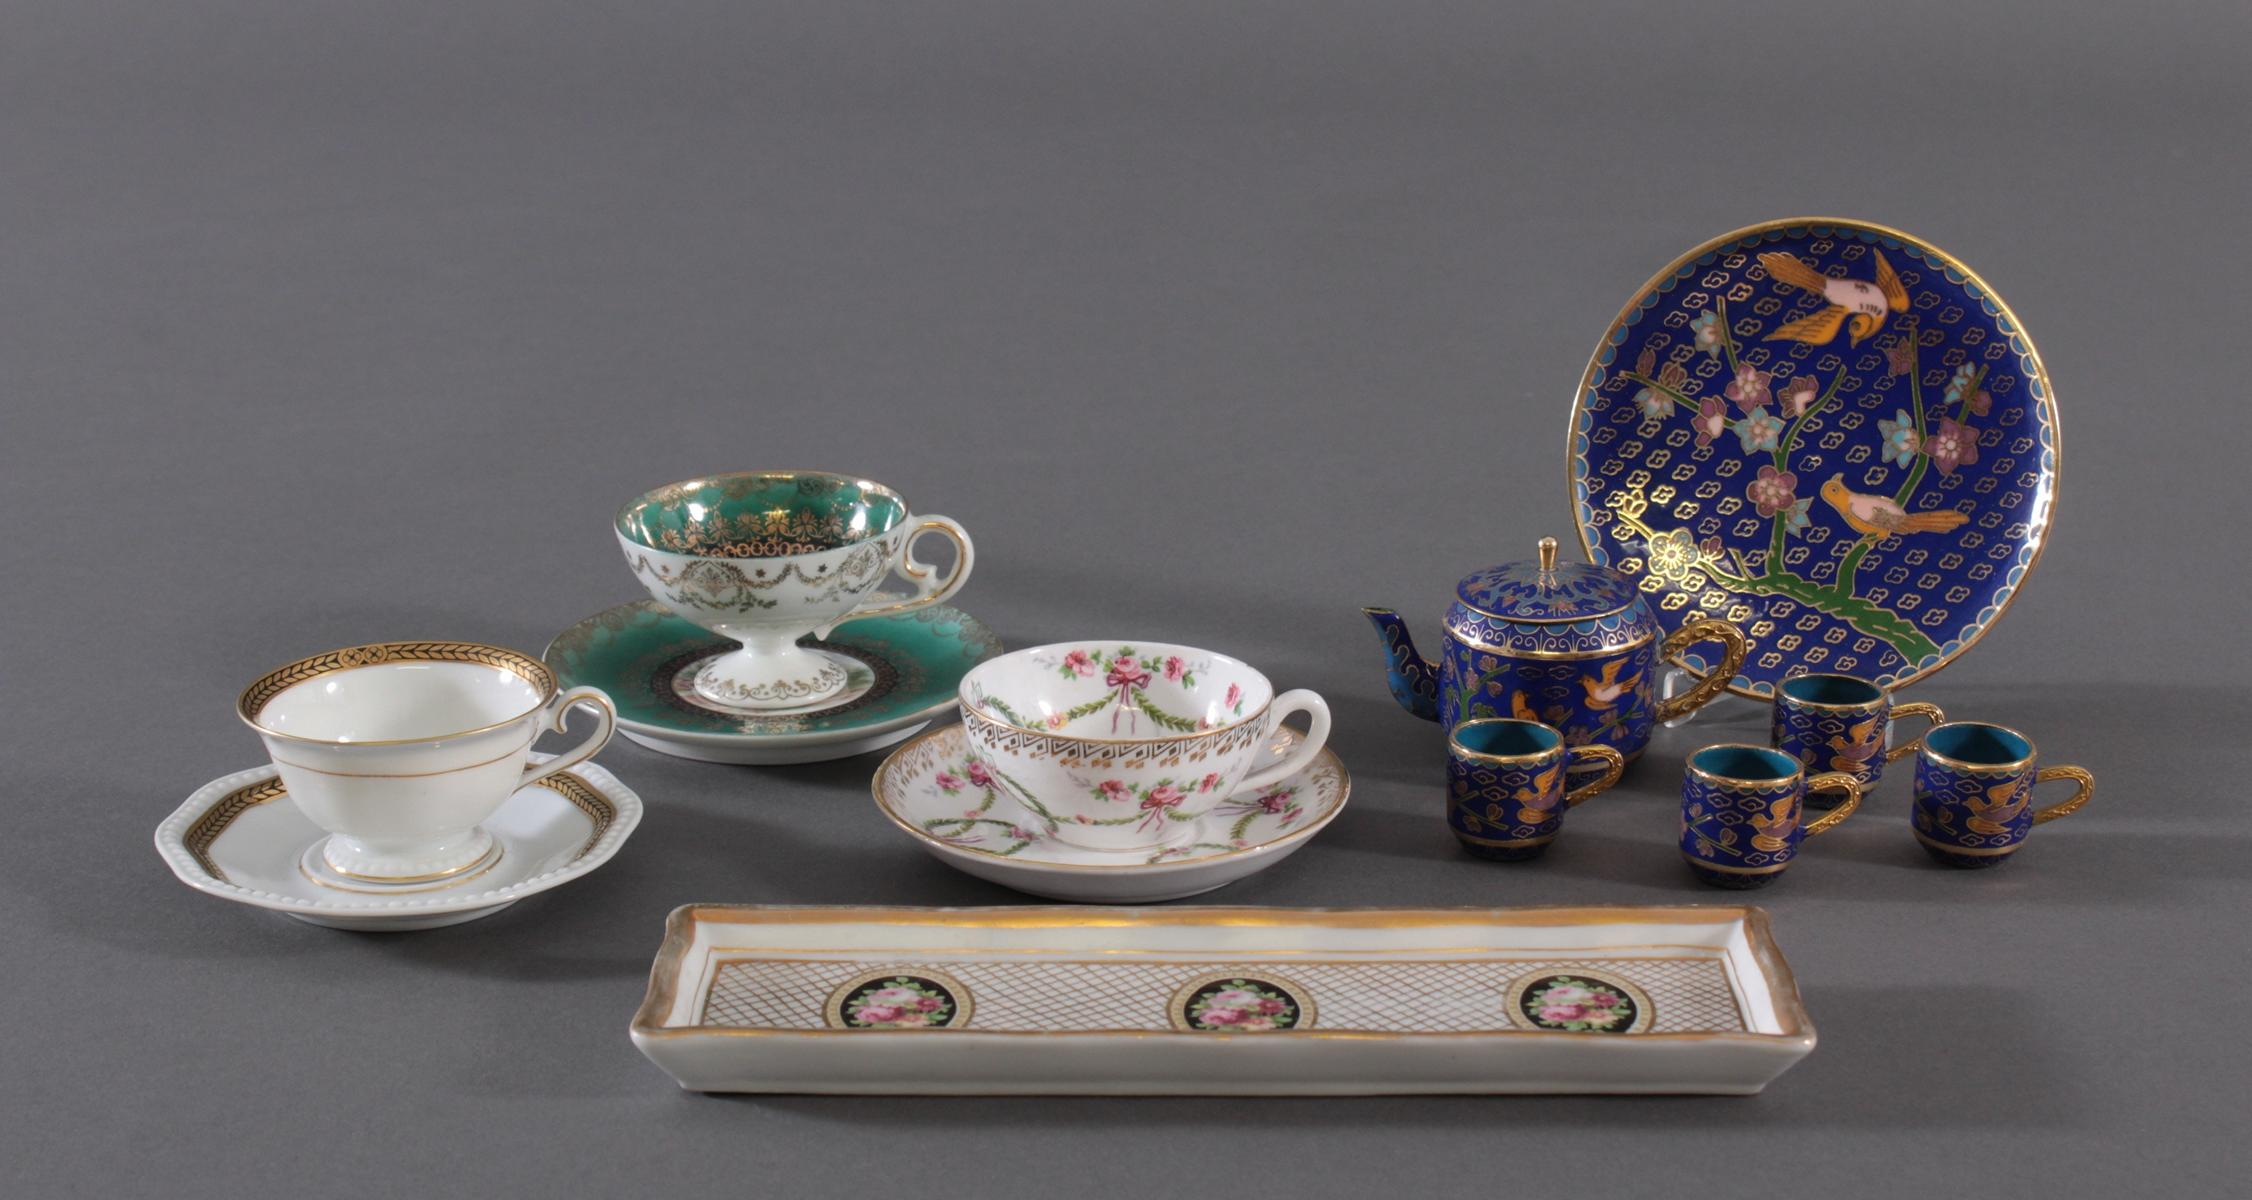 Konvolut Porzellan und Cloisonne – Miniatur-Teeservice